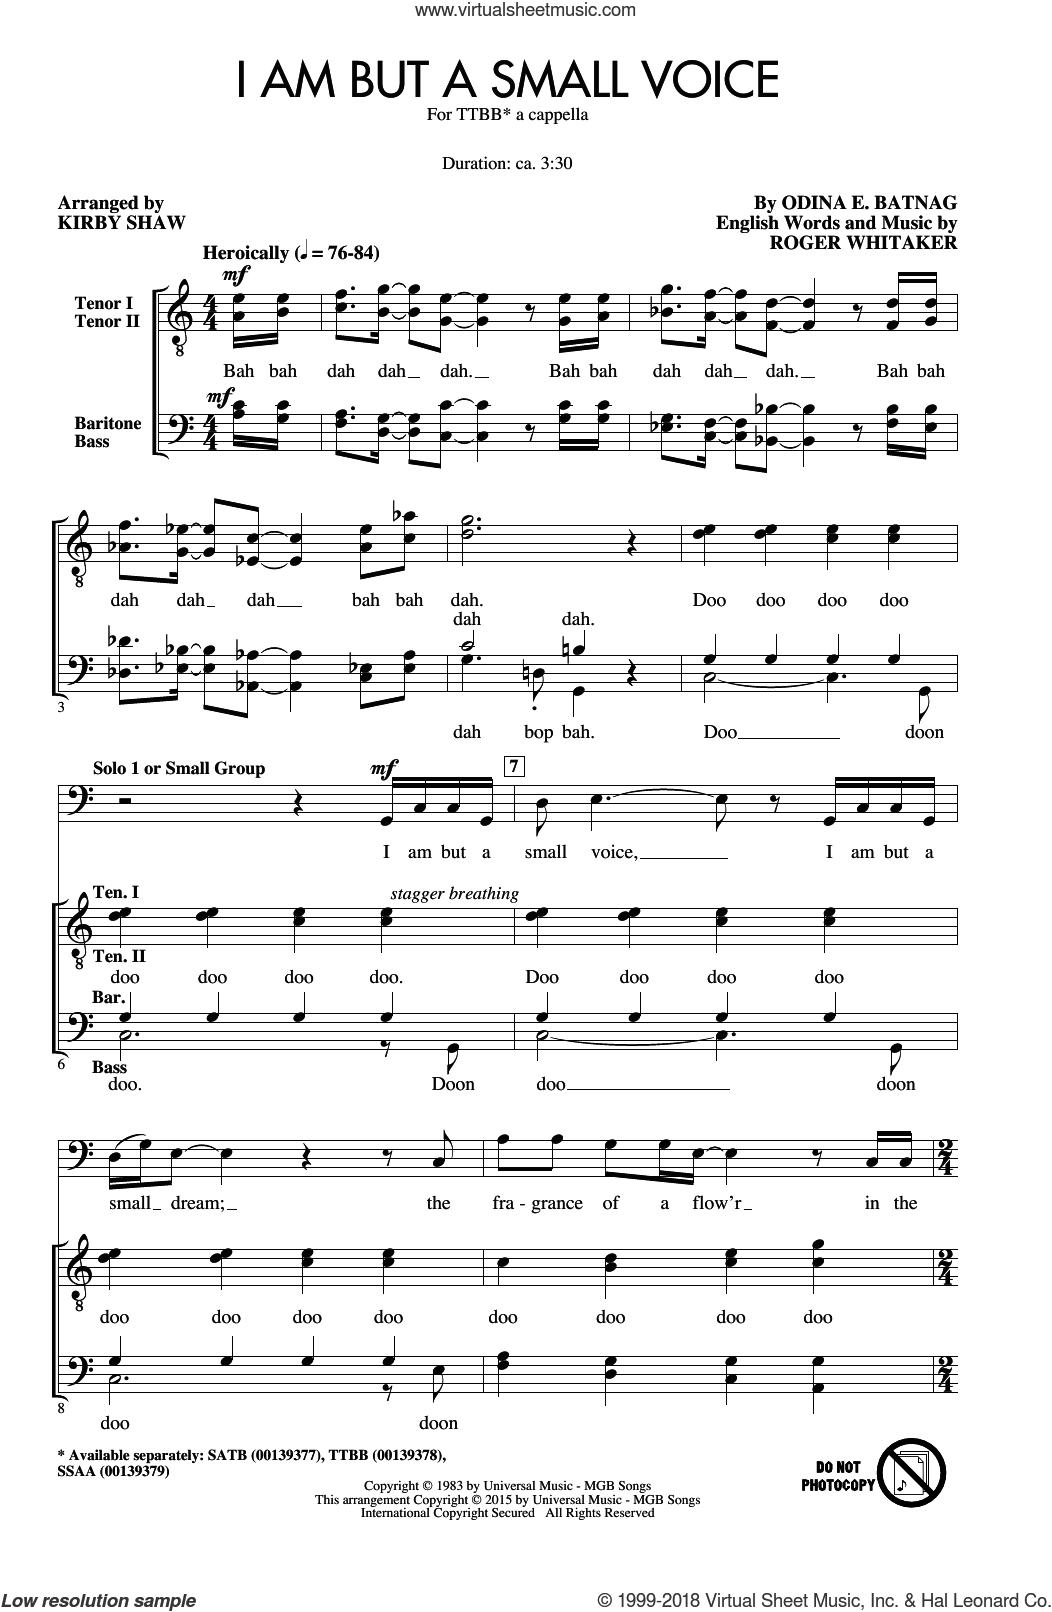 I Am But A Small Voice sheet music for choir (TTBB: tenor, bass) by Kirby Shaw, Odina E. Batnag and Roger Whitaker, intermediate skill level